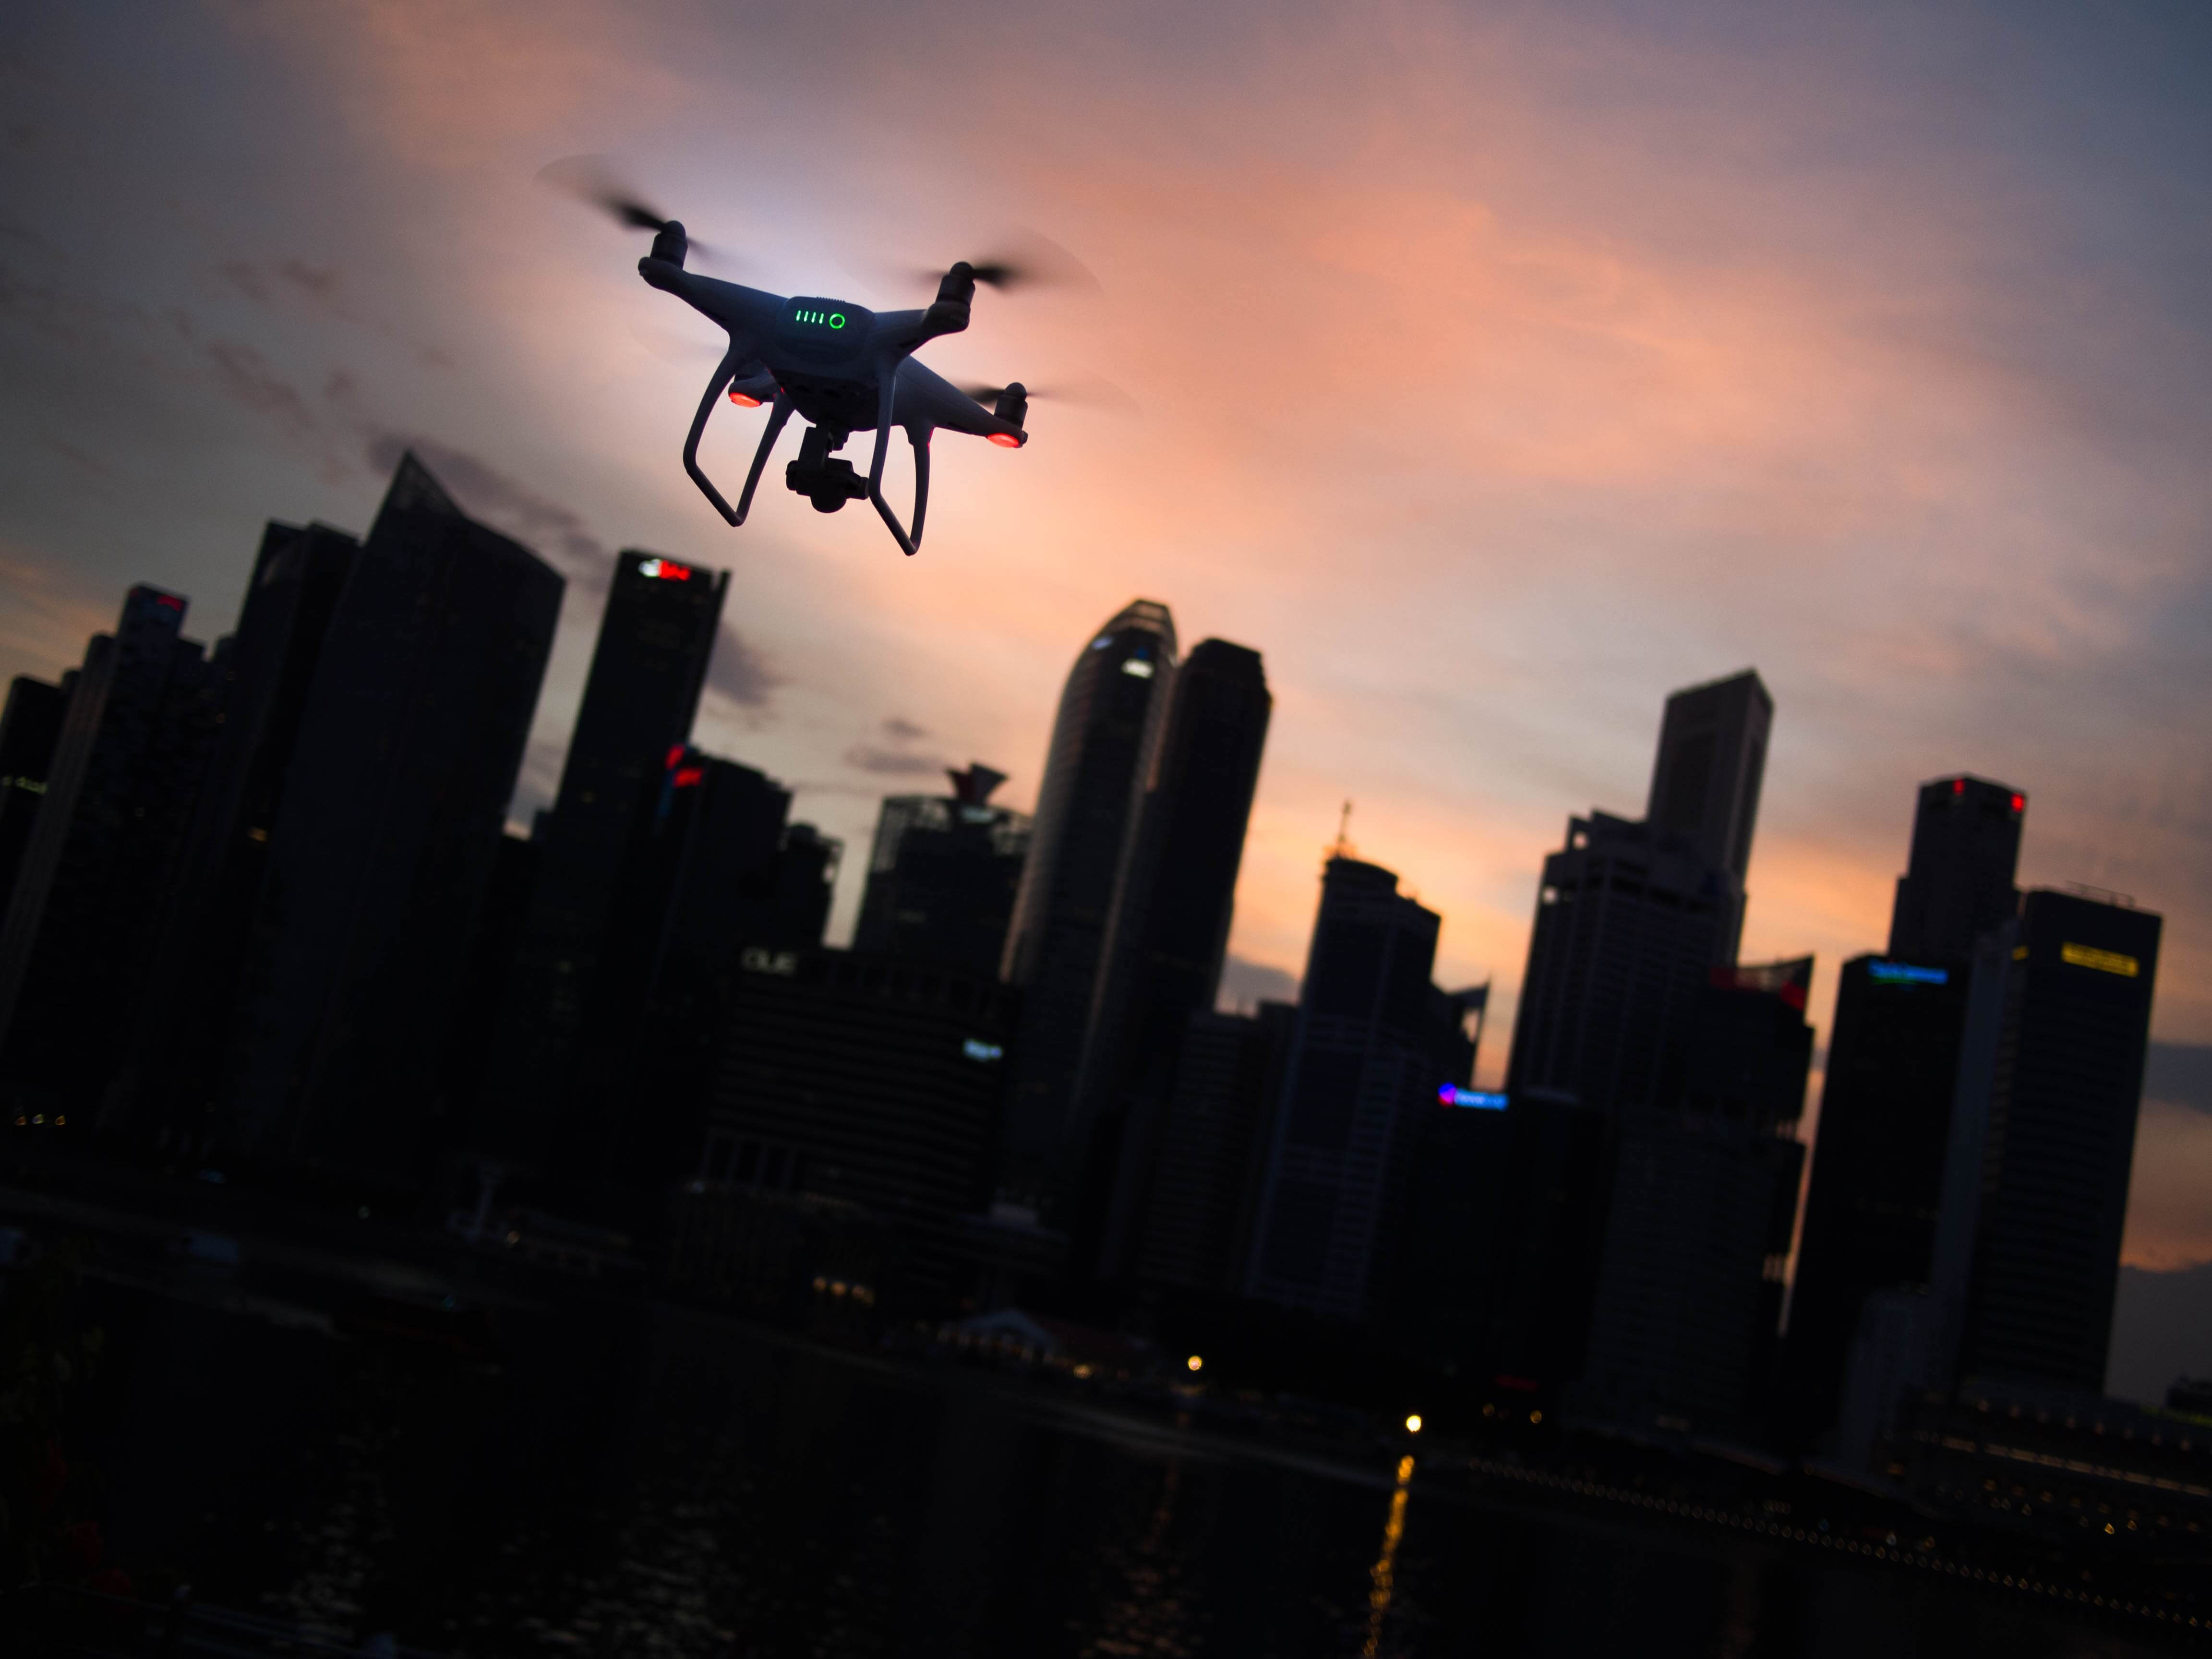 drones construction industry